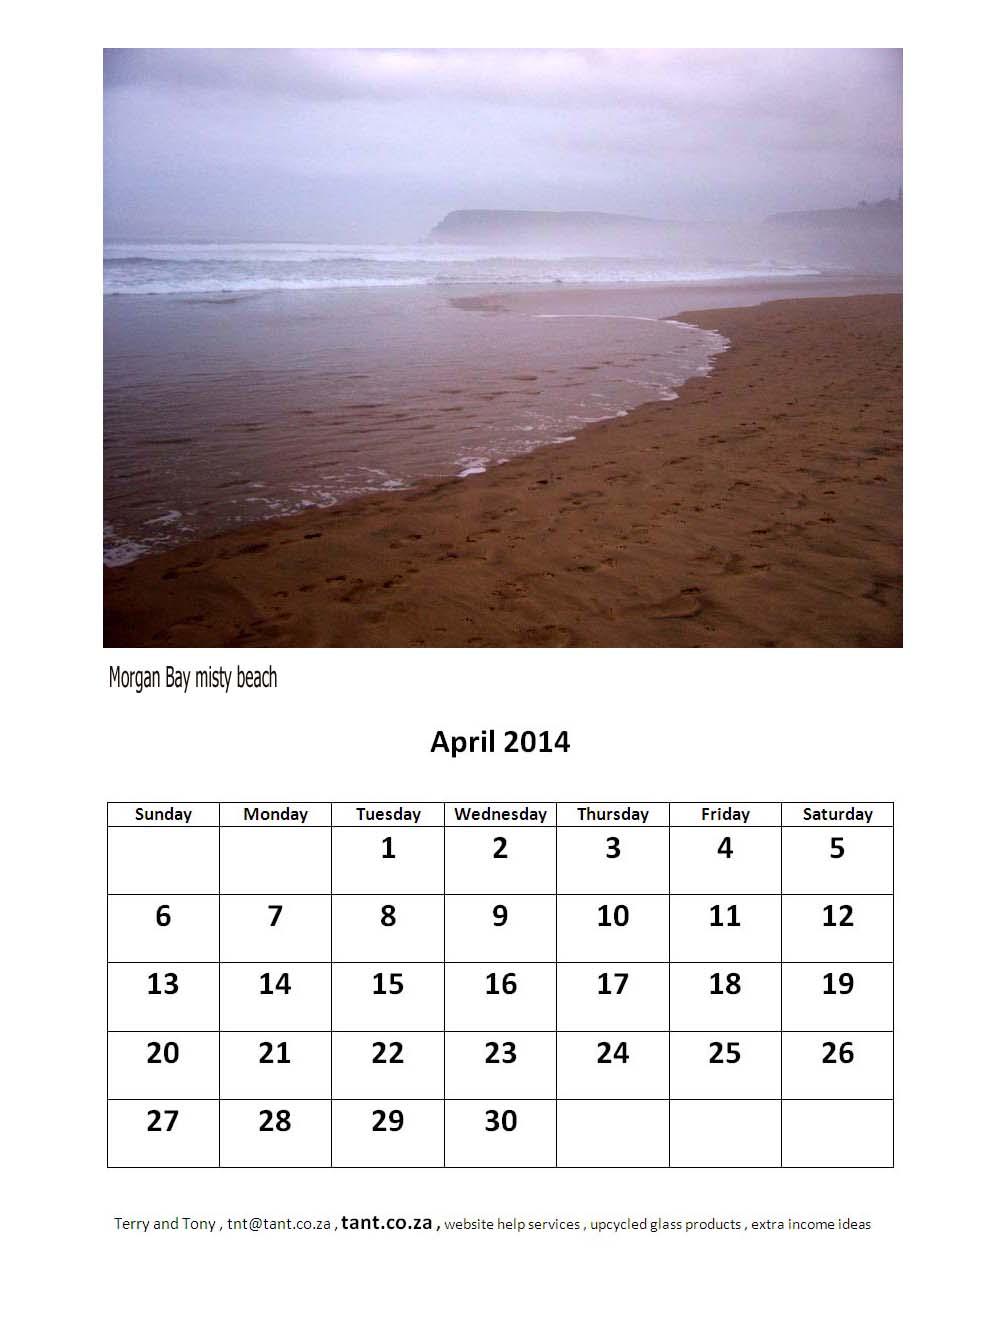 April Calendar London : Free calendar east london beach theme